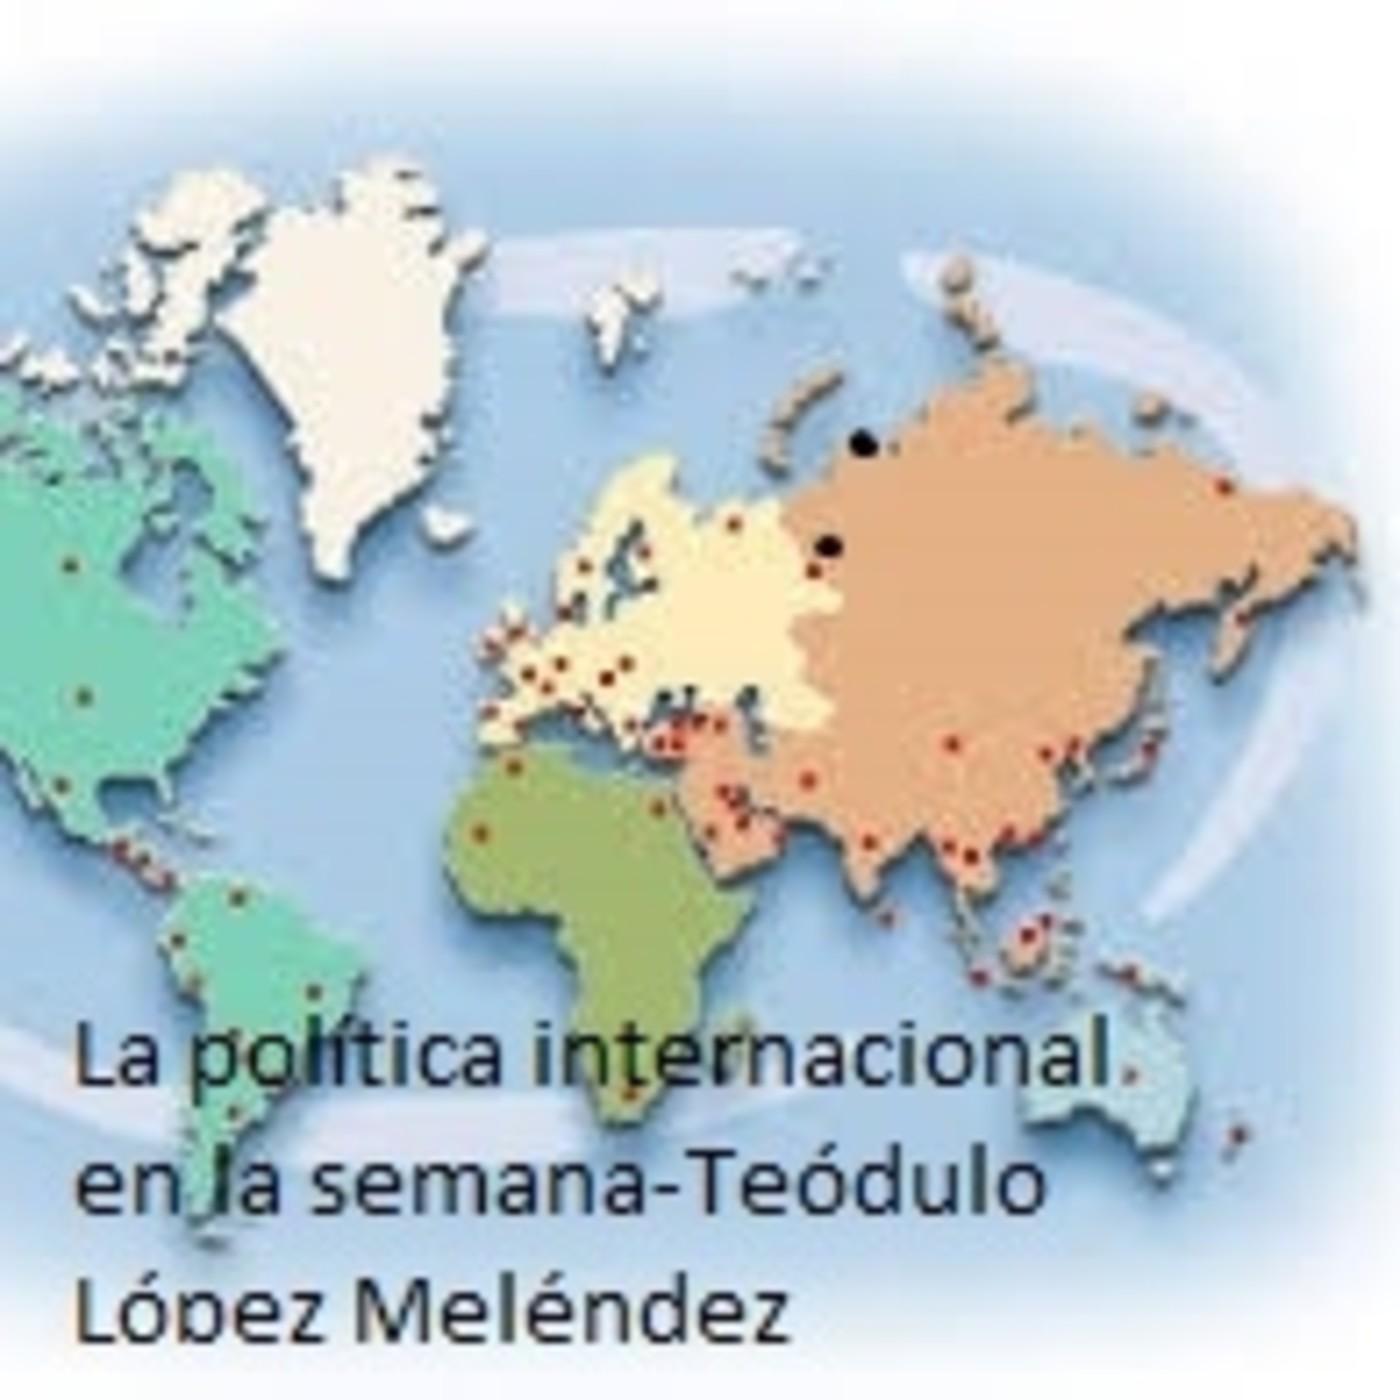 La pol tica internacional en la semana 12 18 febrero 2017 for La politica internacional